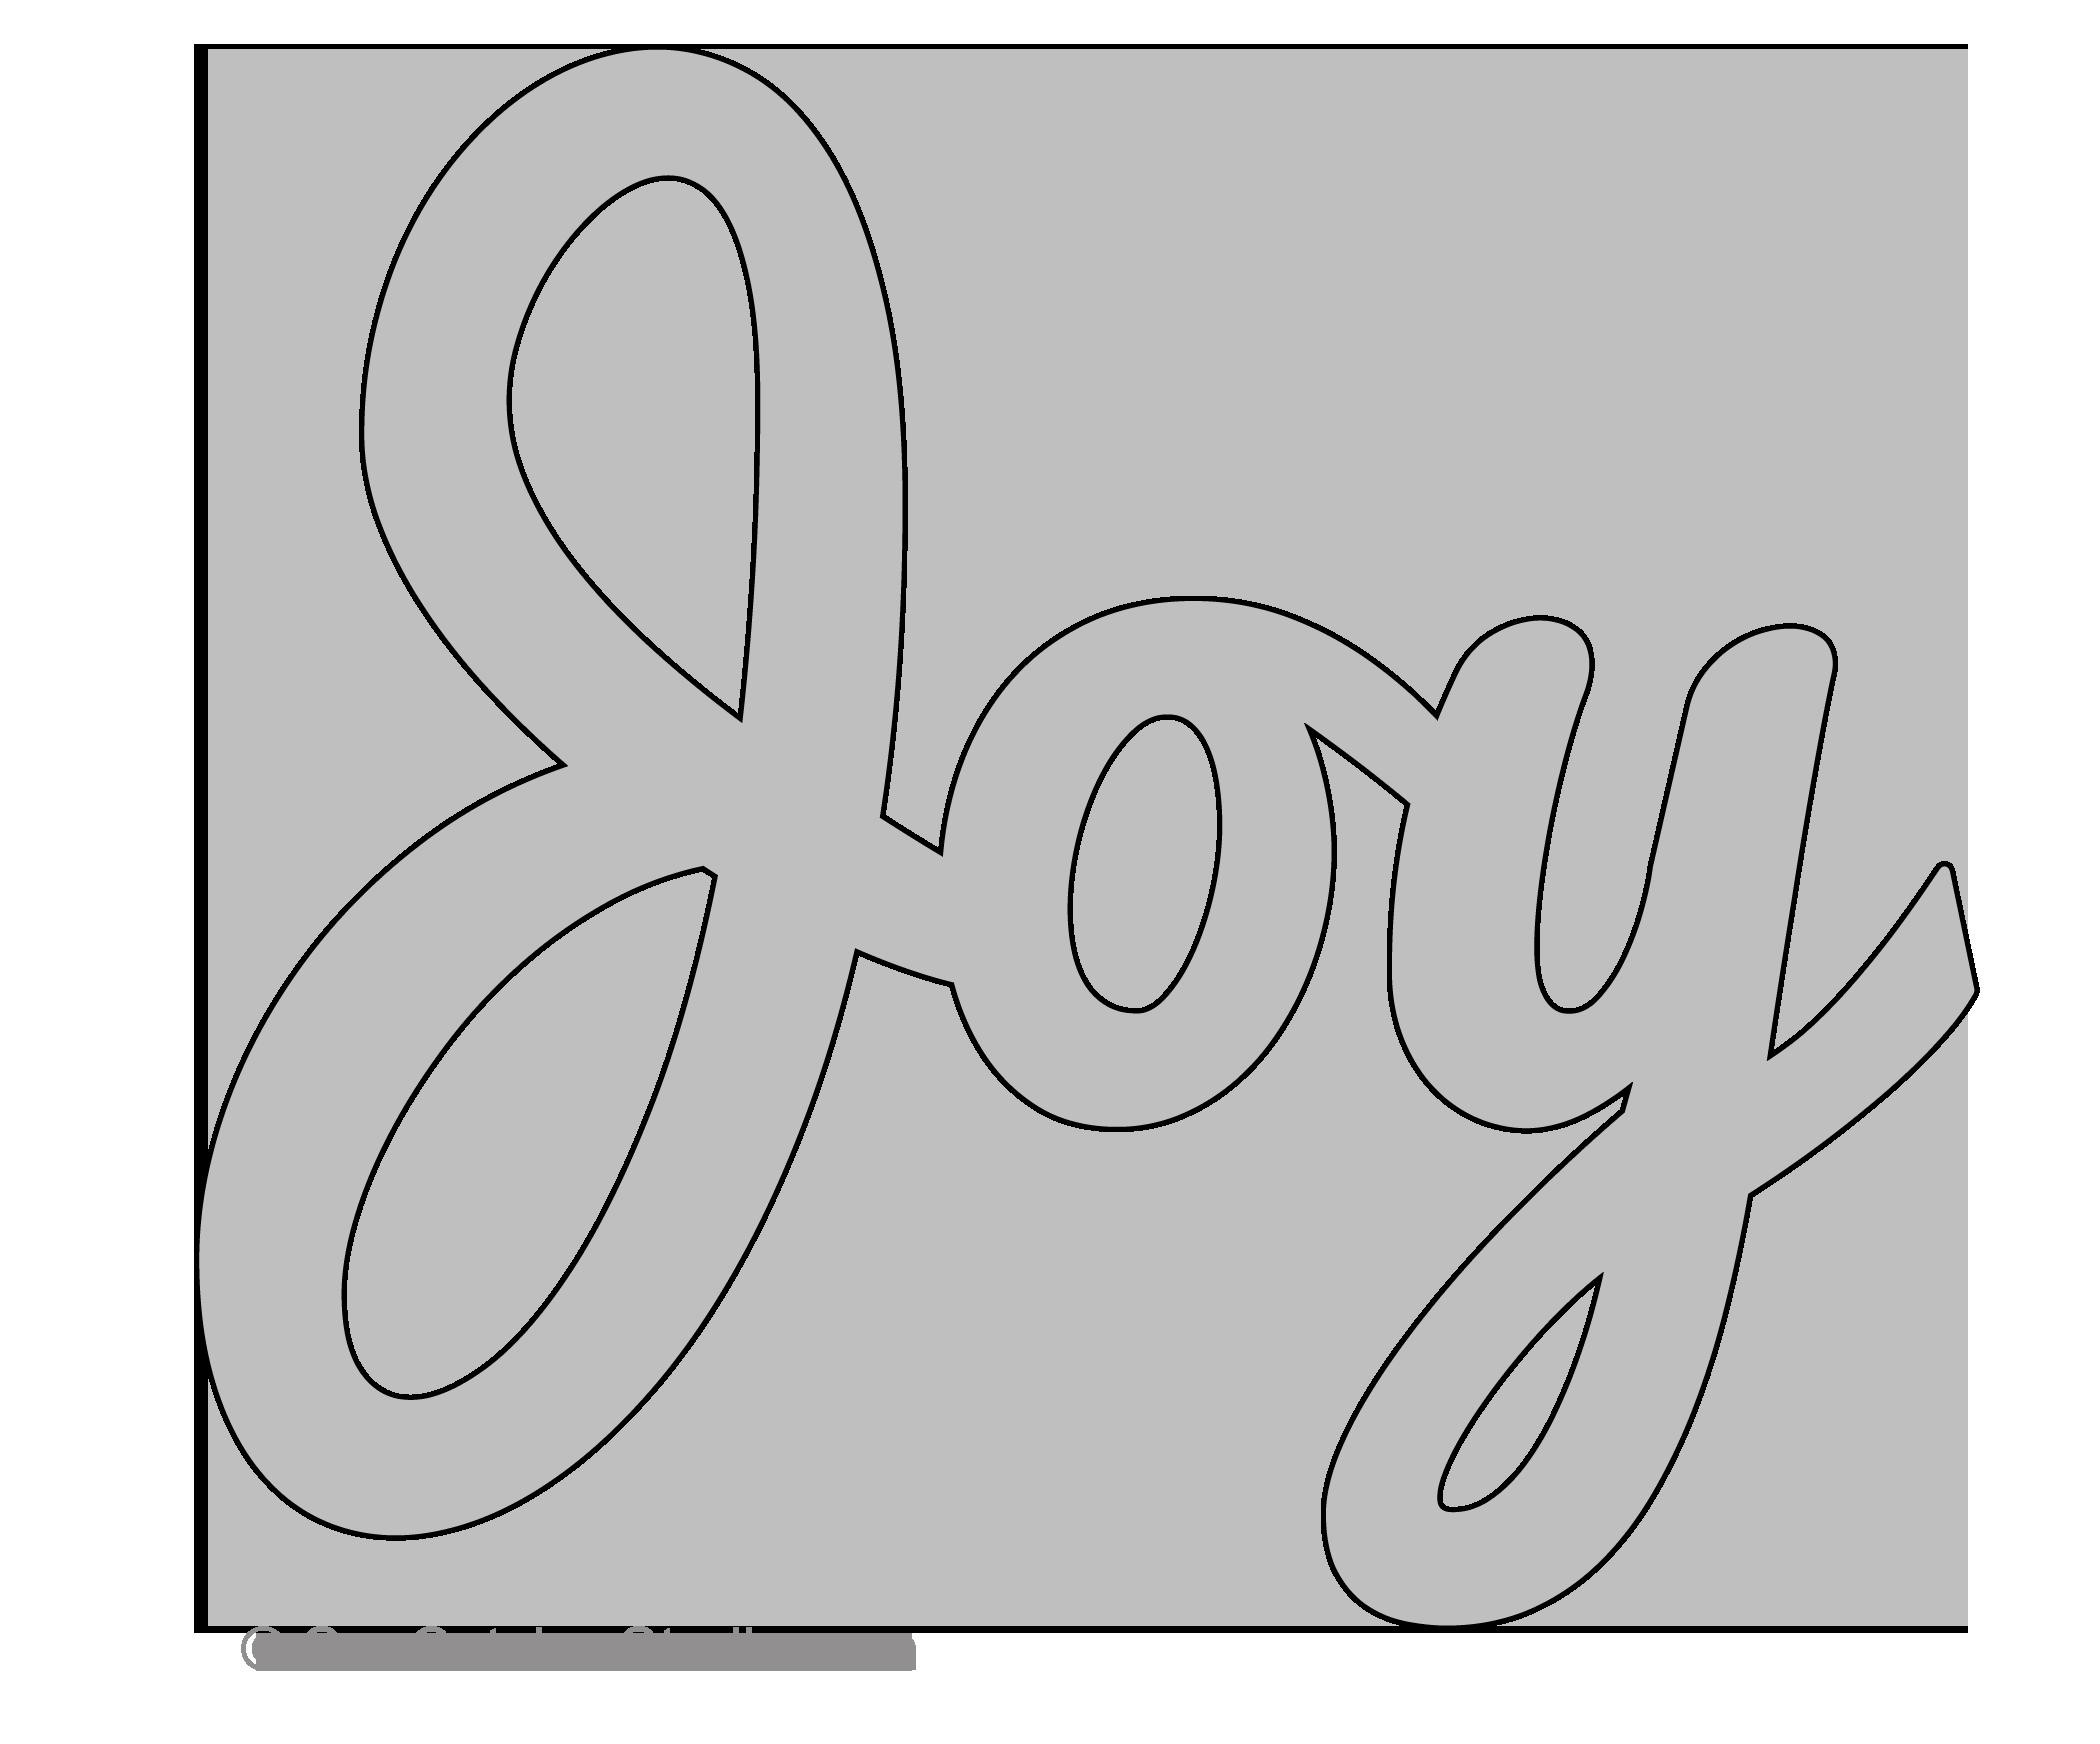 Word Art Patterns Templates Stencils Free Printable Designs Word Art Stencils Printables Templates Word Art Design